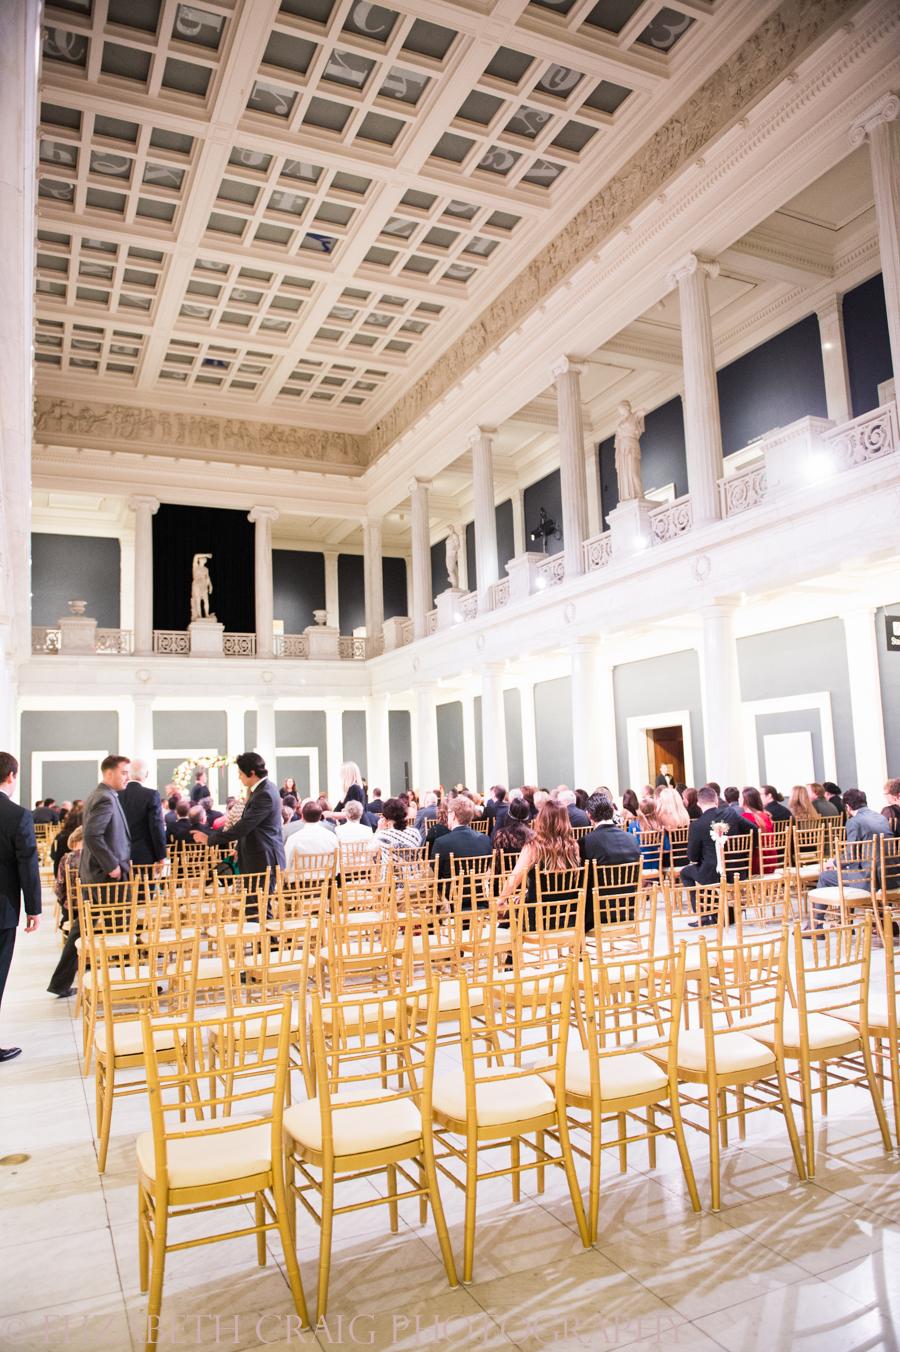 Carnegie Museum of Art Weddings | Elizabeth Craig Photography-0049